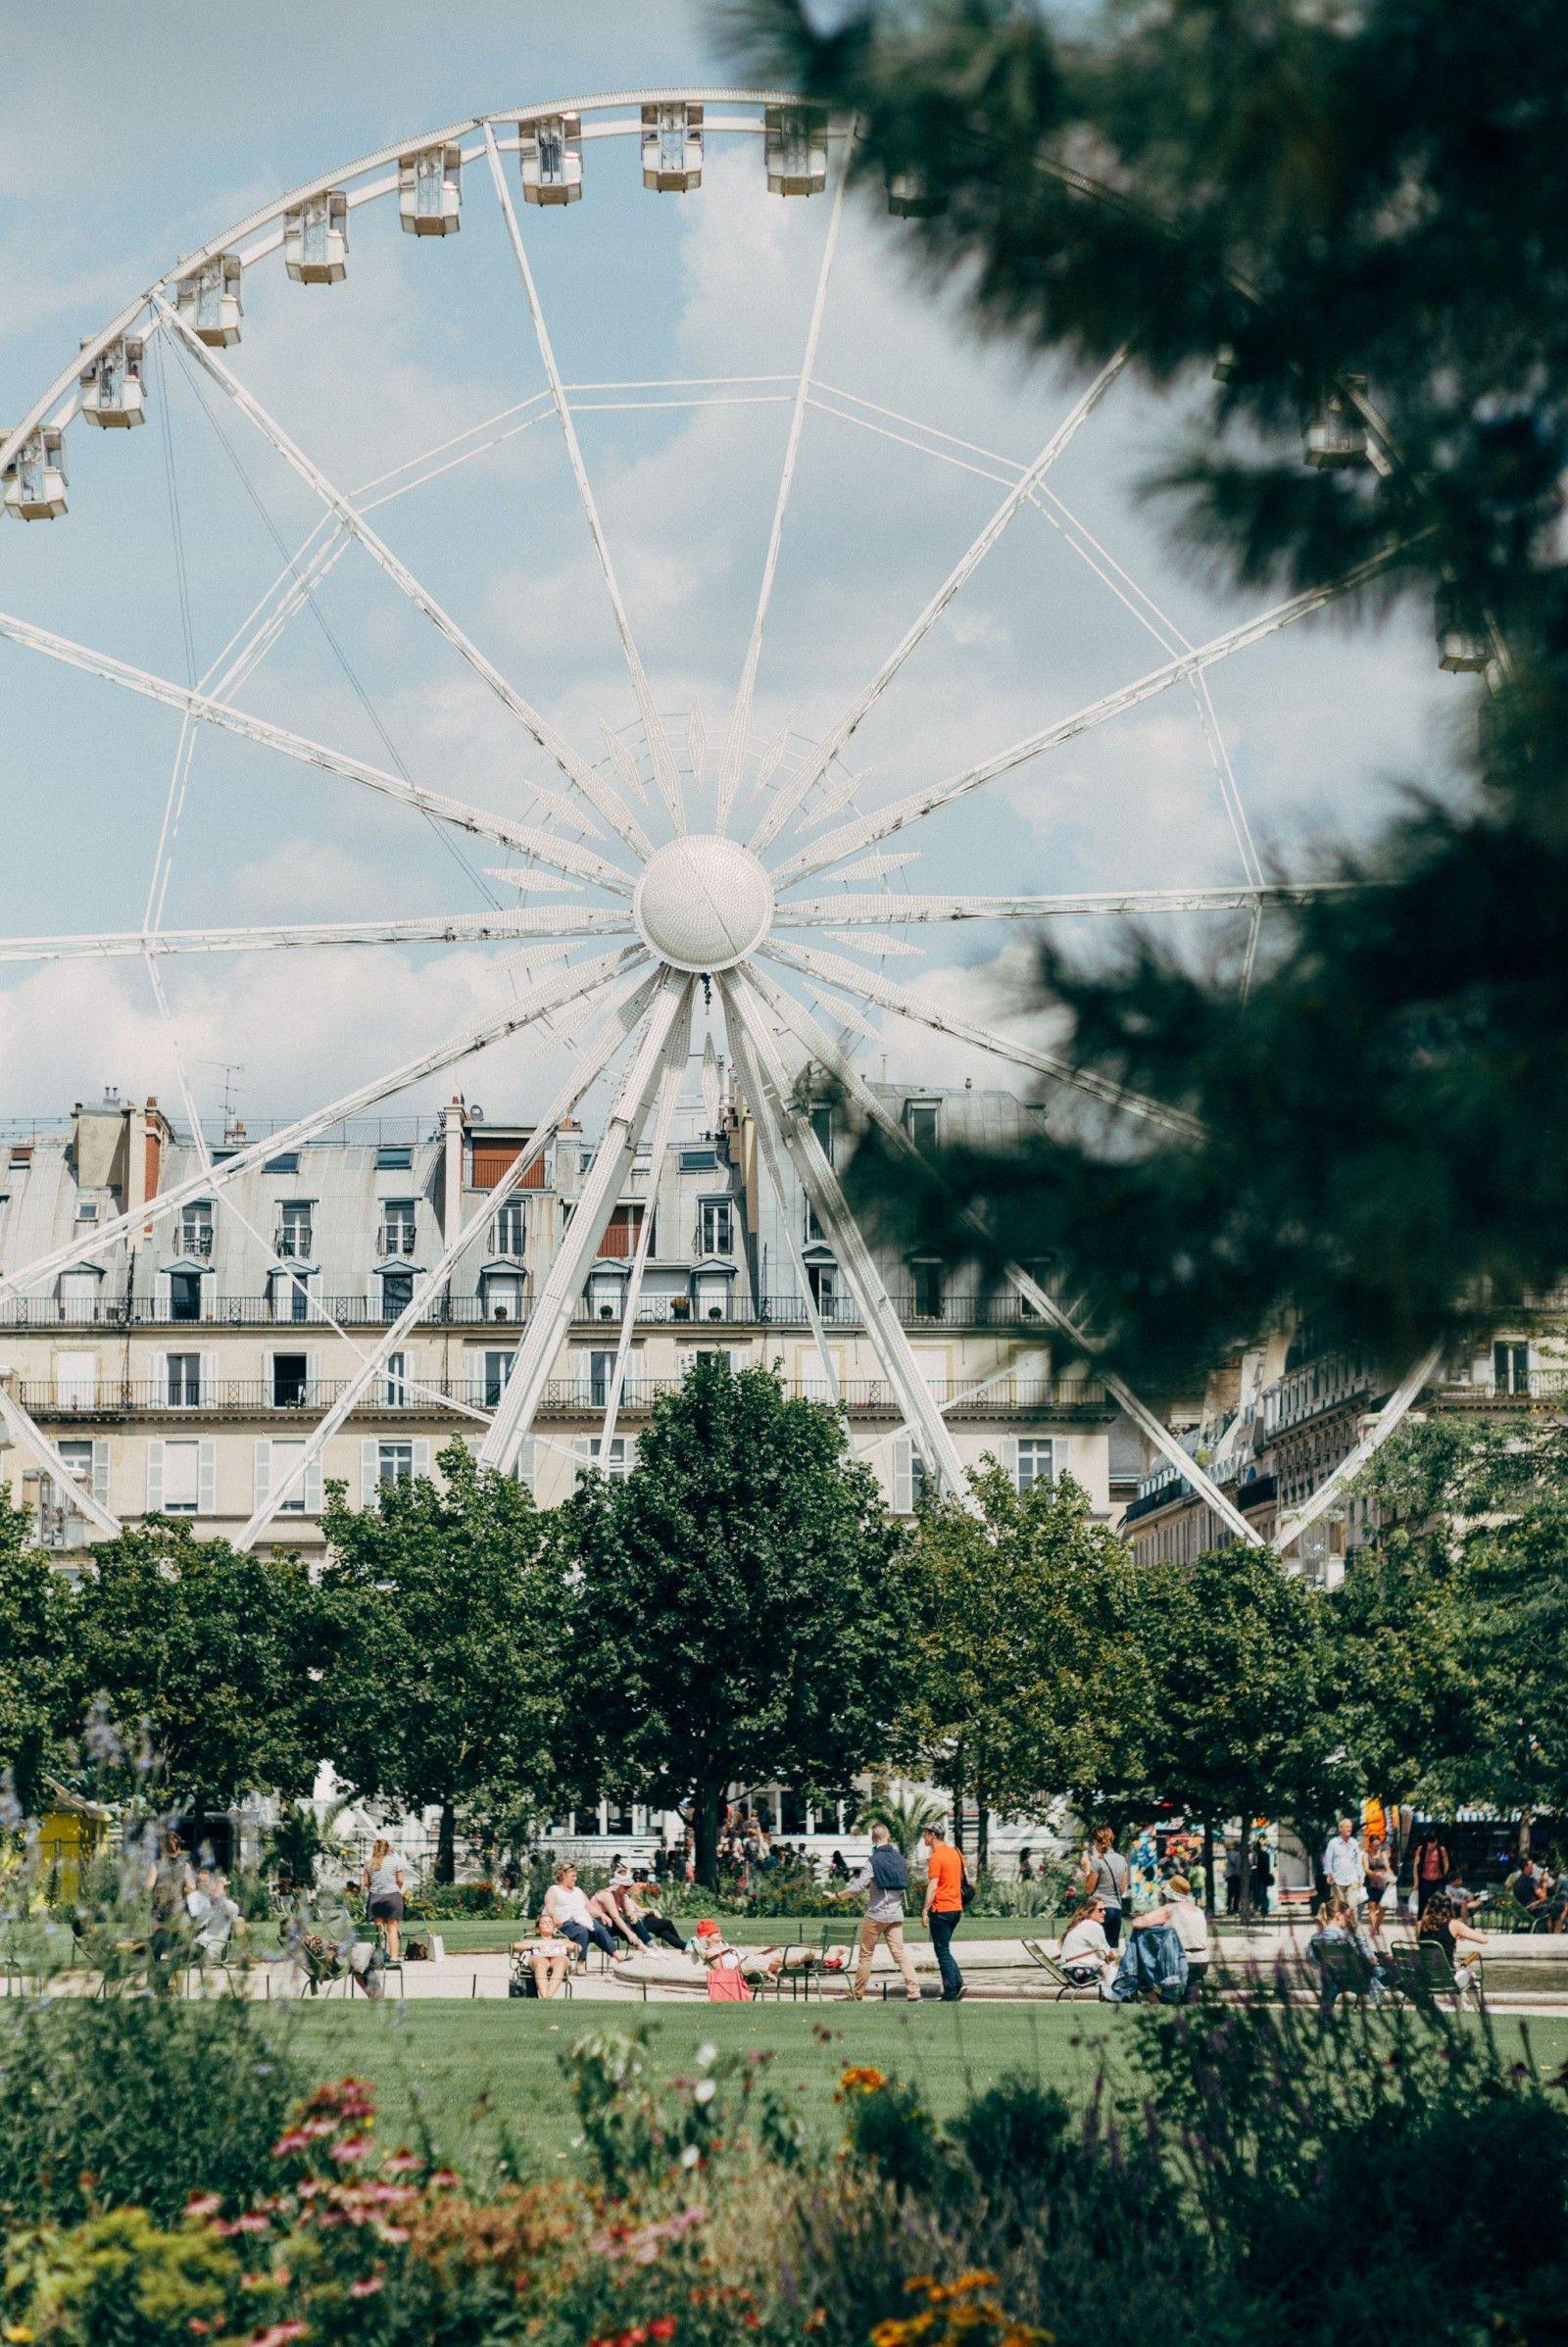 The ferris wheel, a tourist attraction.